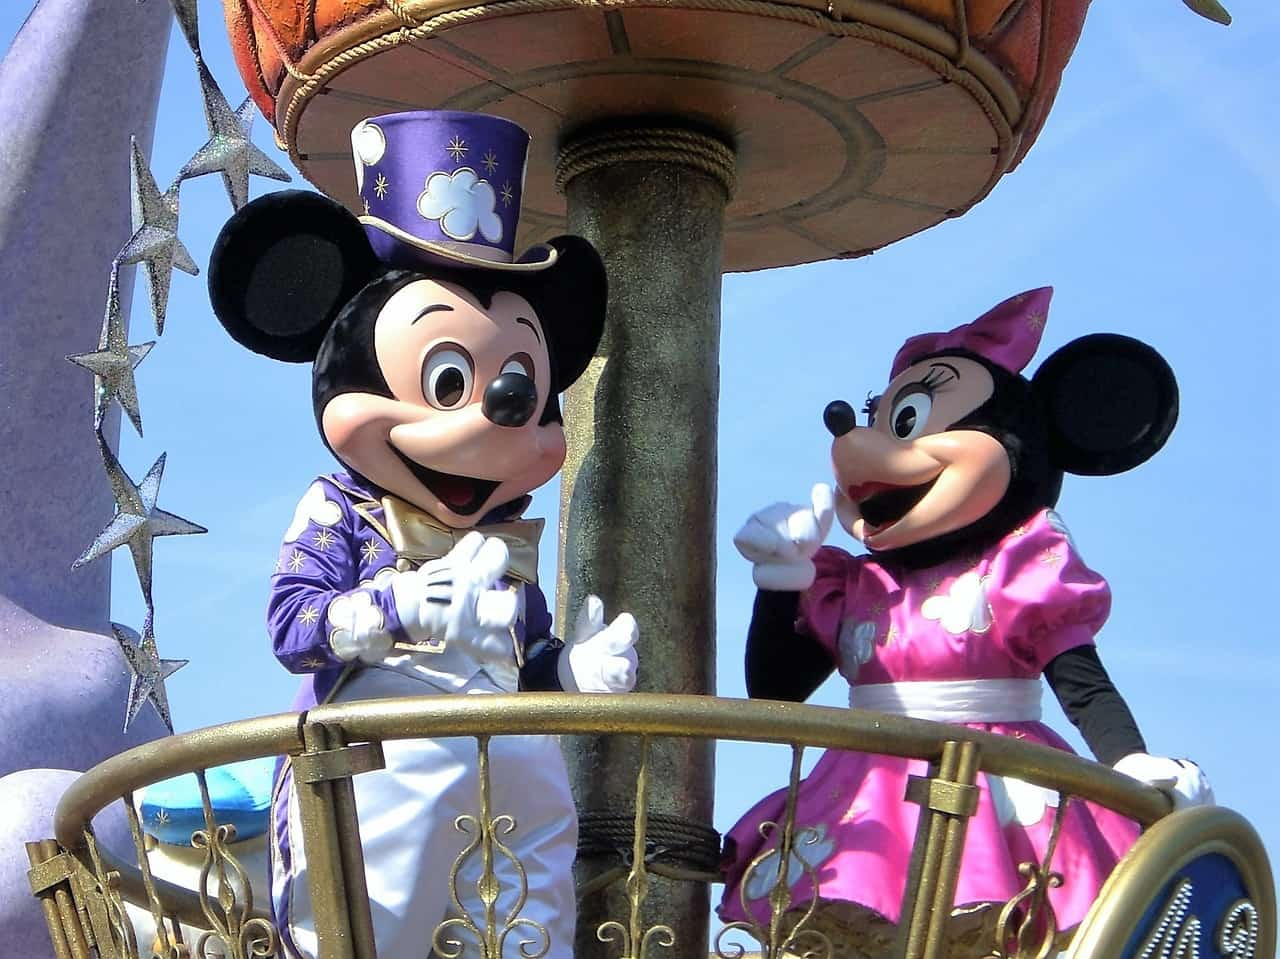 Orlando / Disney World / Disneyland / Cheapest Places To Travel